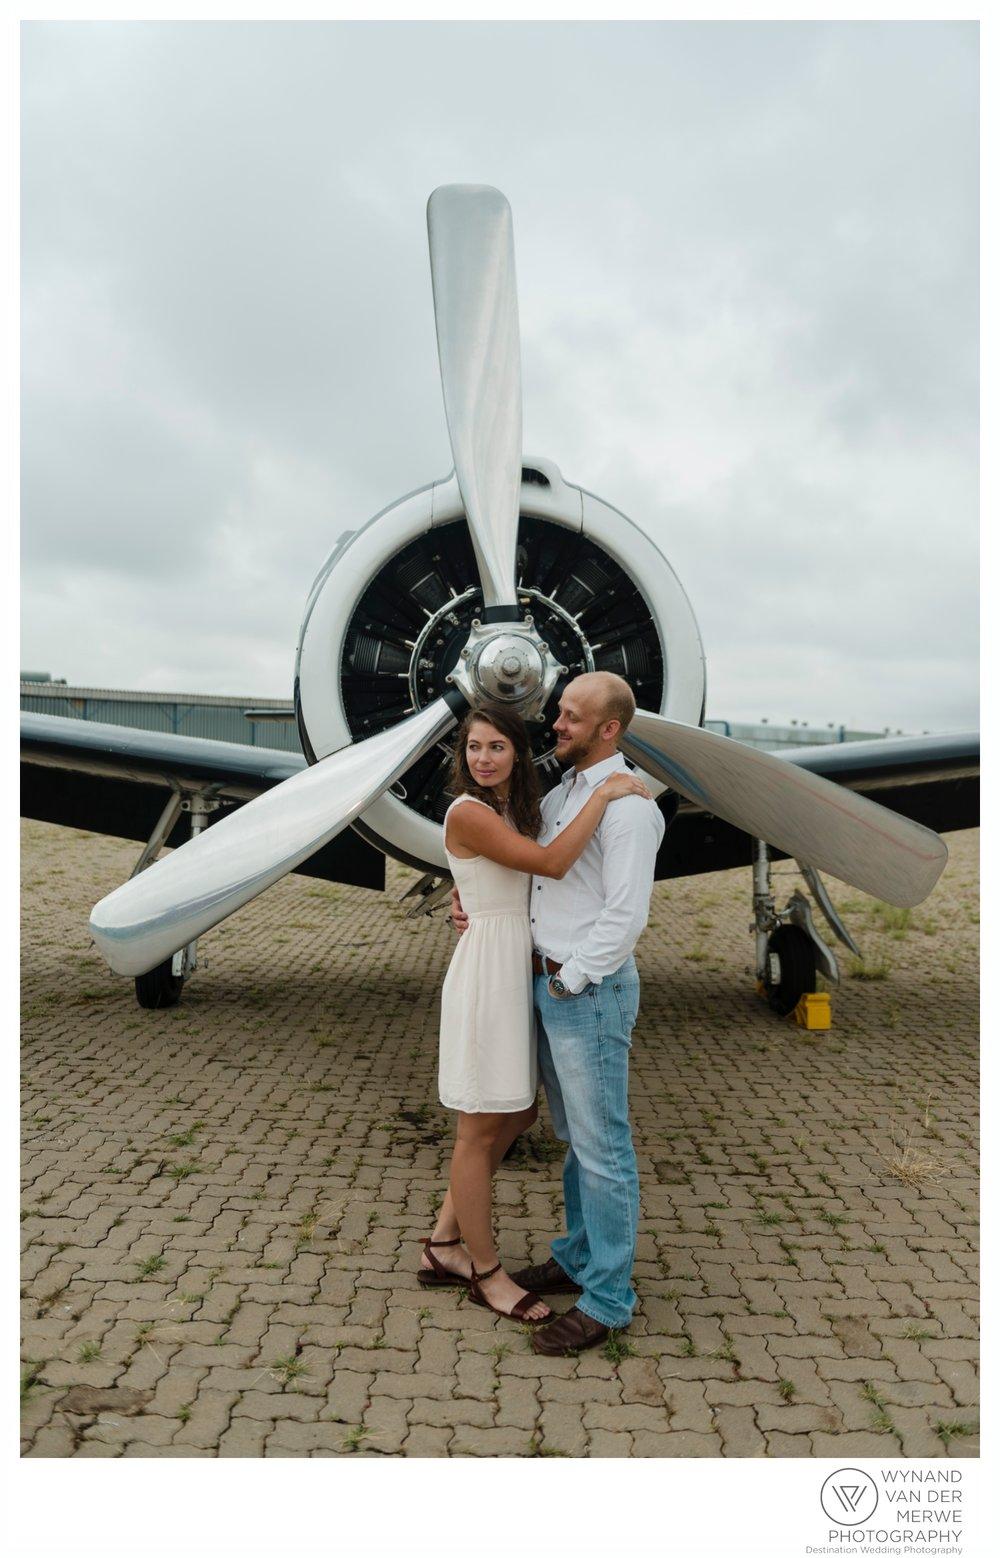 WynandvanderMerwe_weddingphotography_engagementshoot_wonderboomairport_aeroplane_klaasjanmareli_gauteng_2018-97.jpg